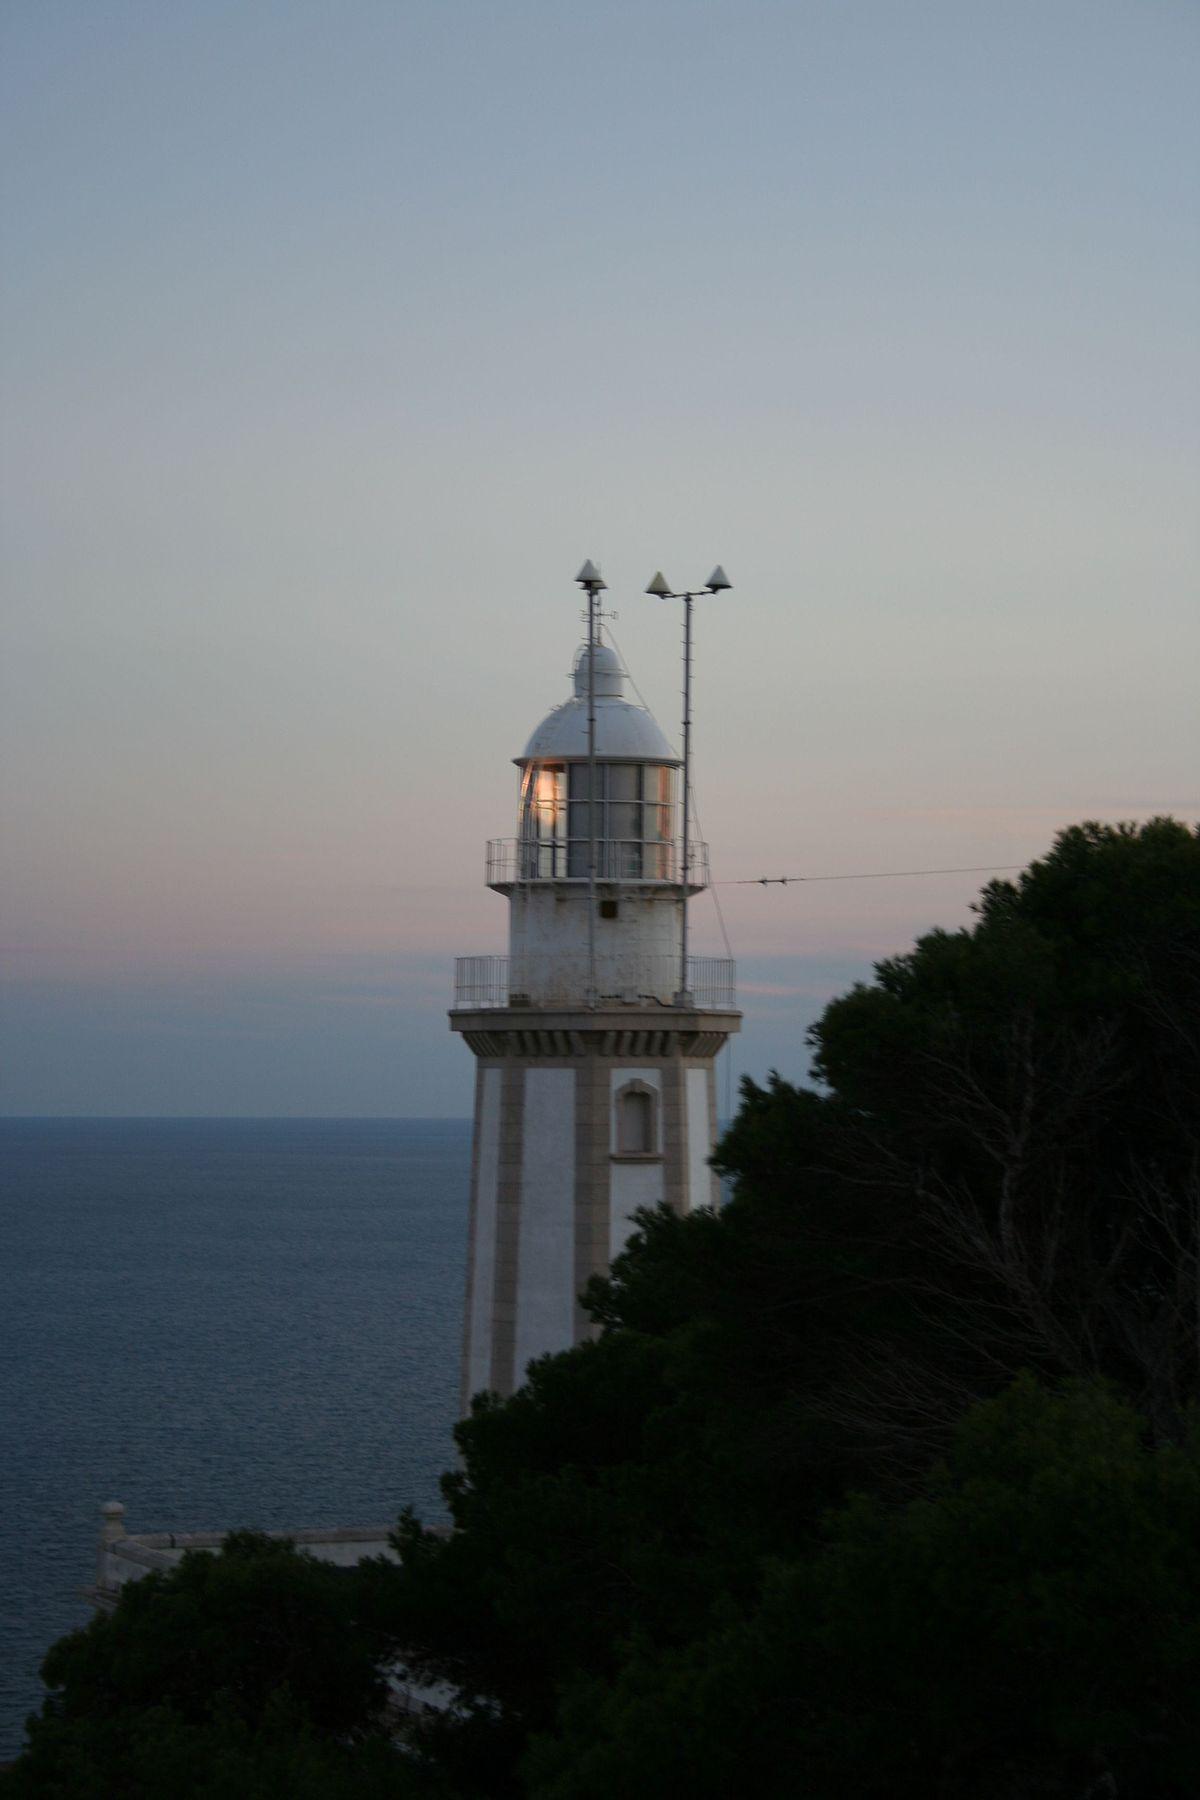 Cabo de la nao wikipedia la enciclopedia libre for Planimetrie del faro